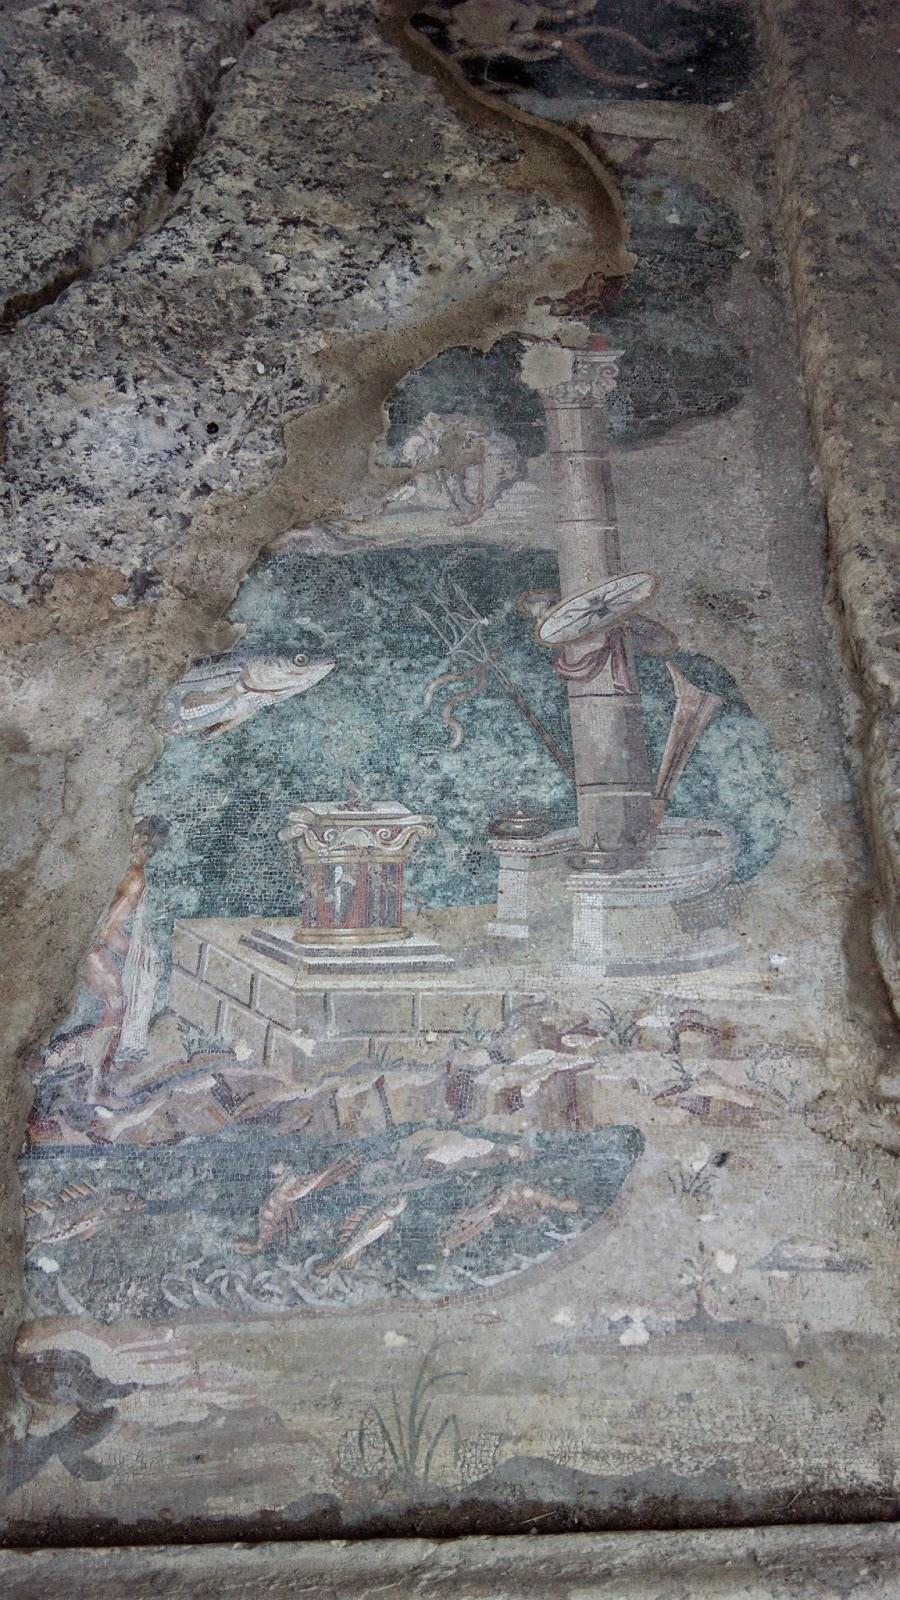 mosaico desligado palestrina - Bate-e-volta à Palestrina